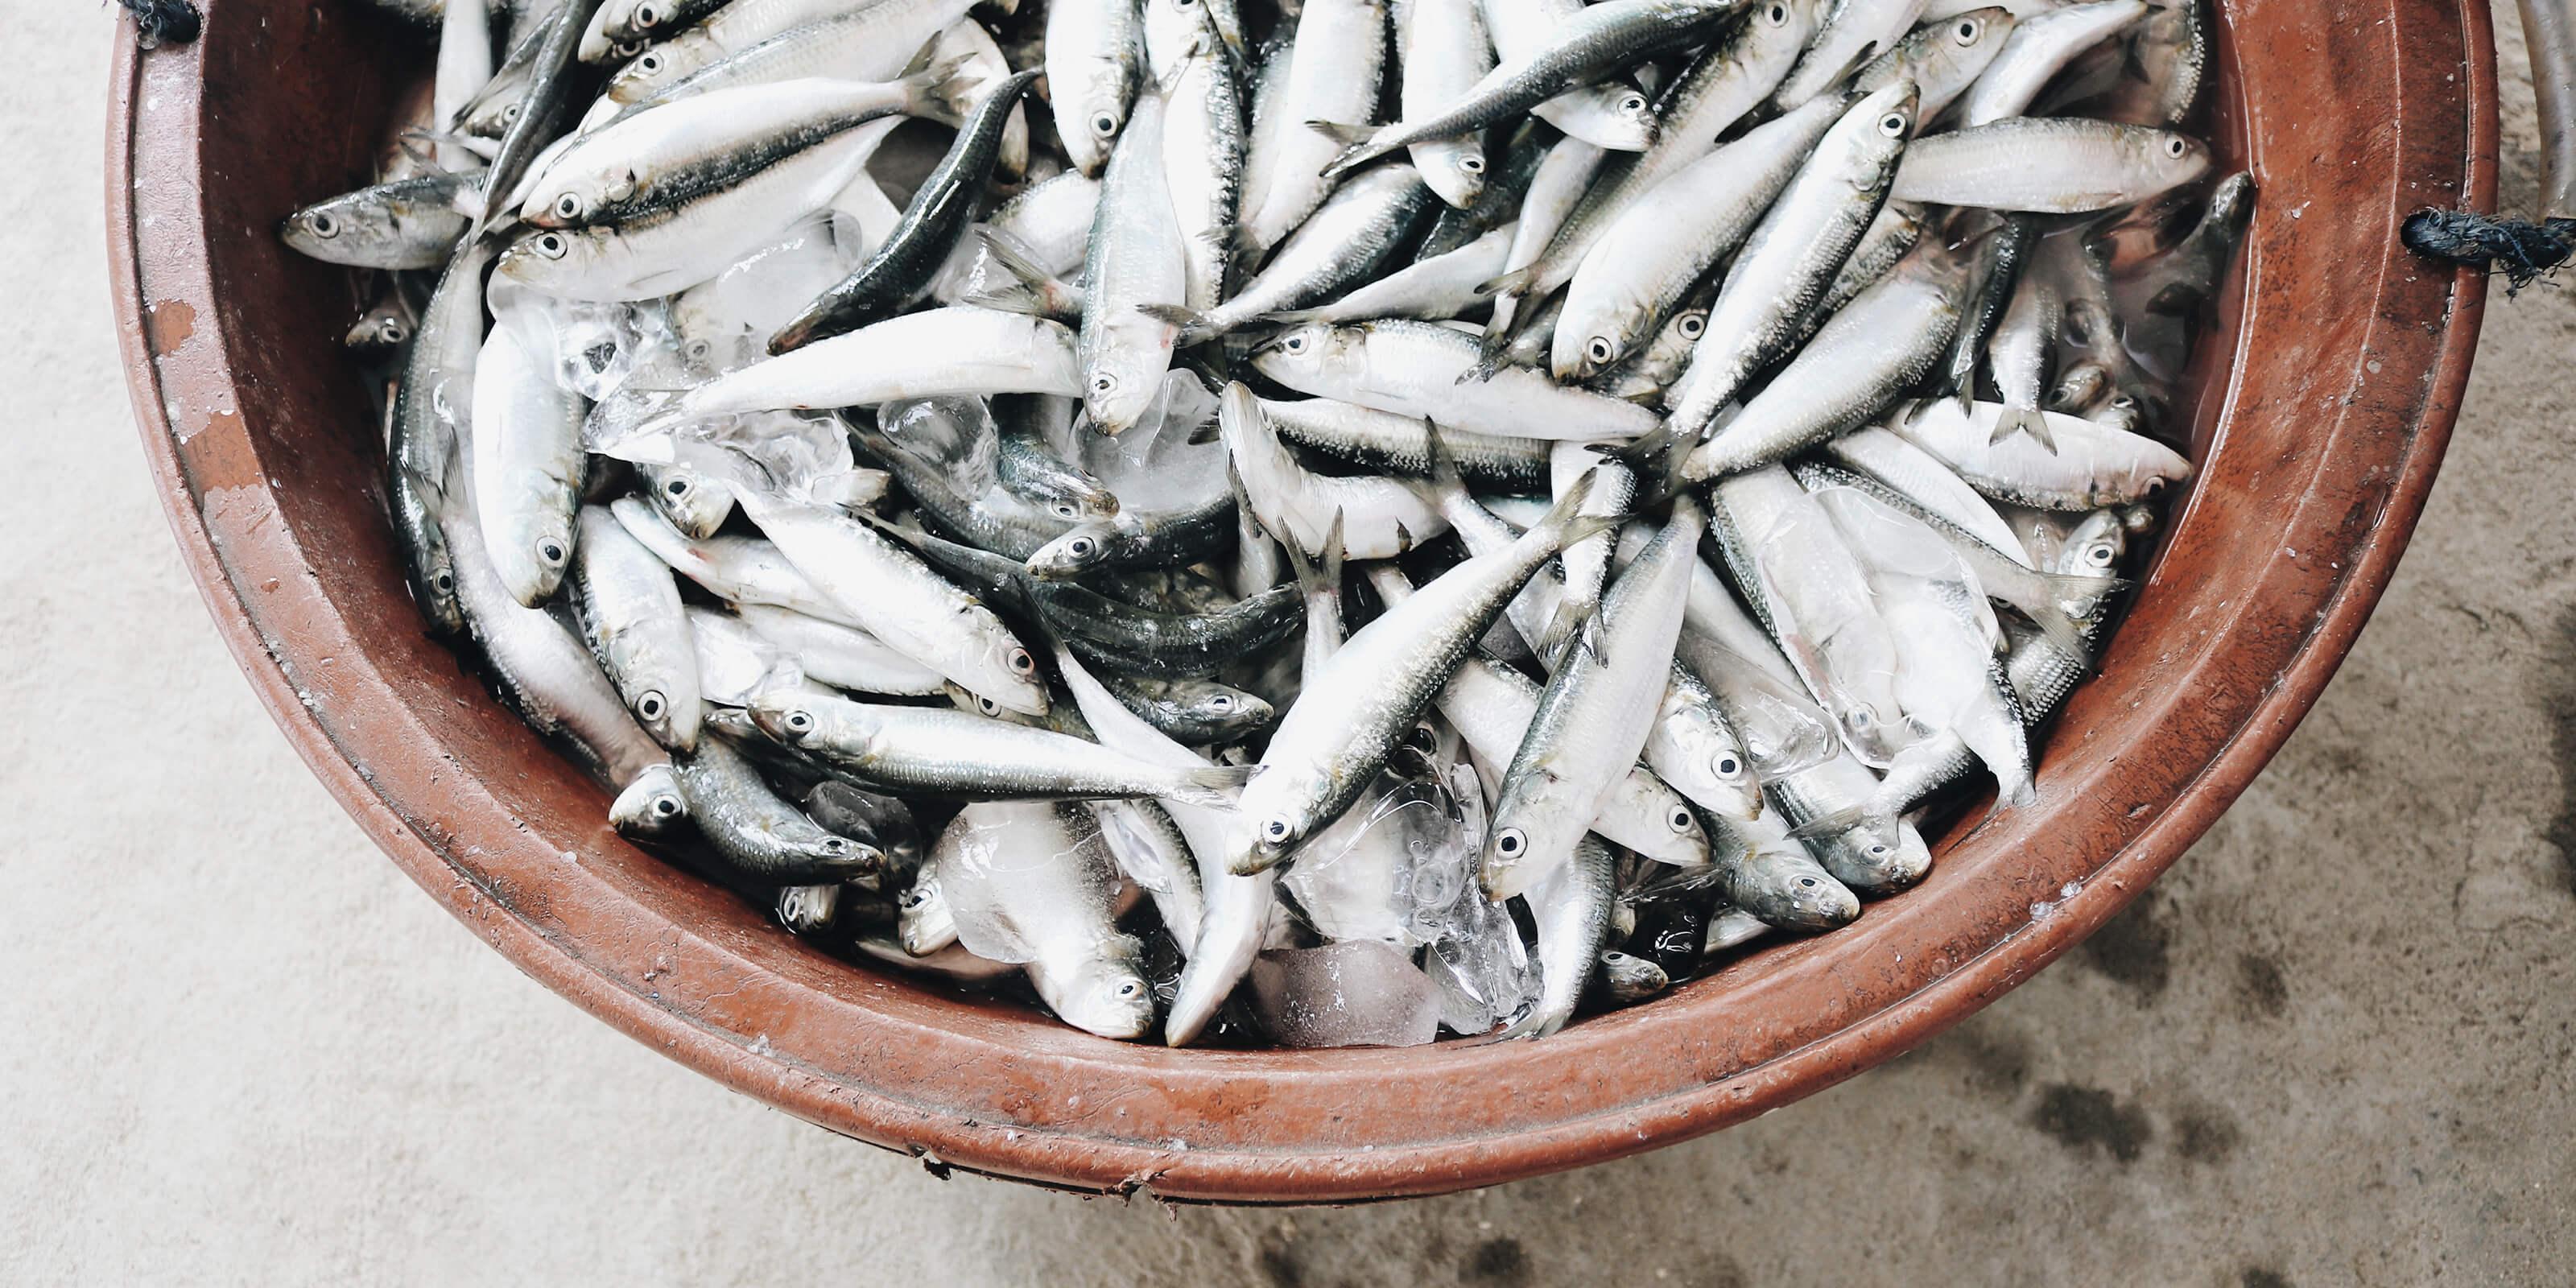 bucket full of sardines